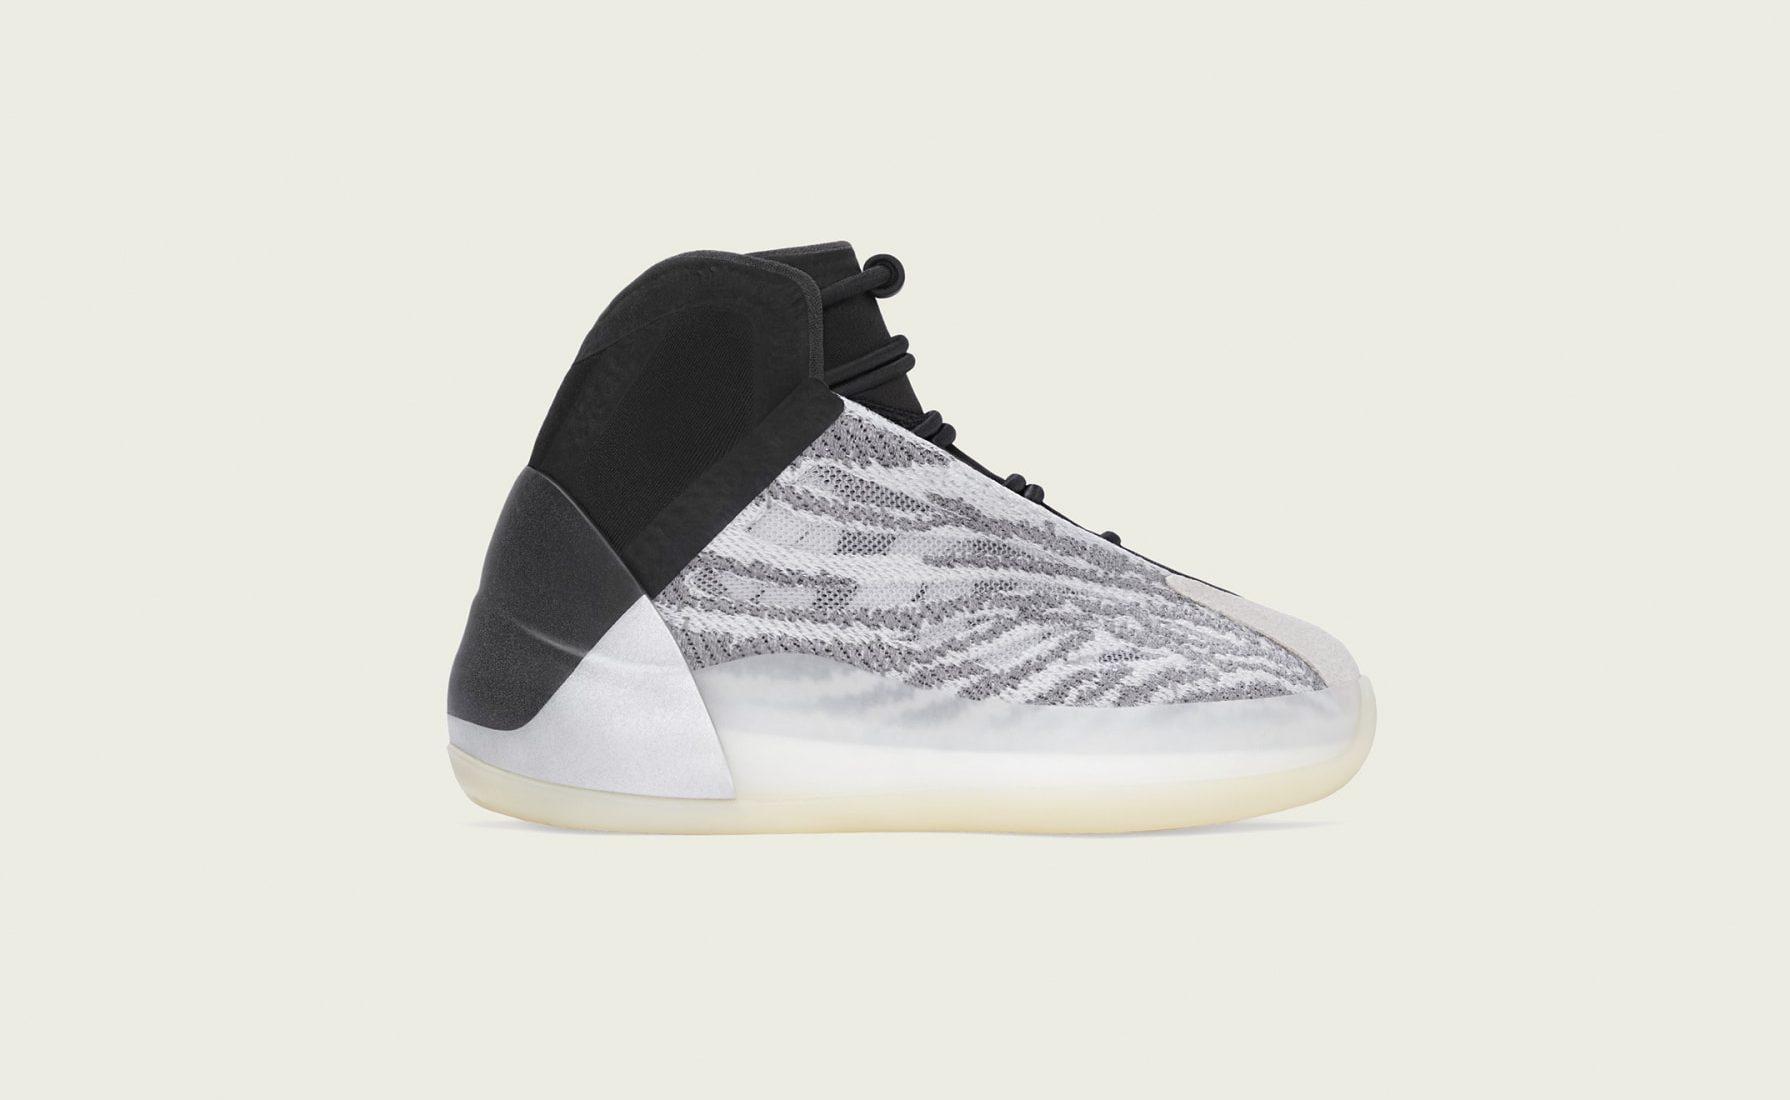 Adidas Yeezy QNTM 'Quantum' Restock